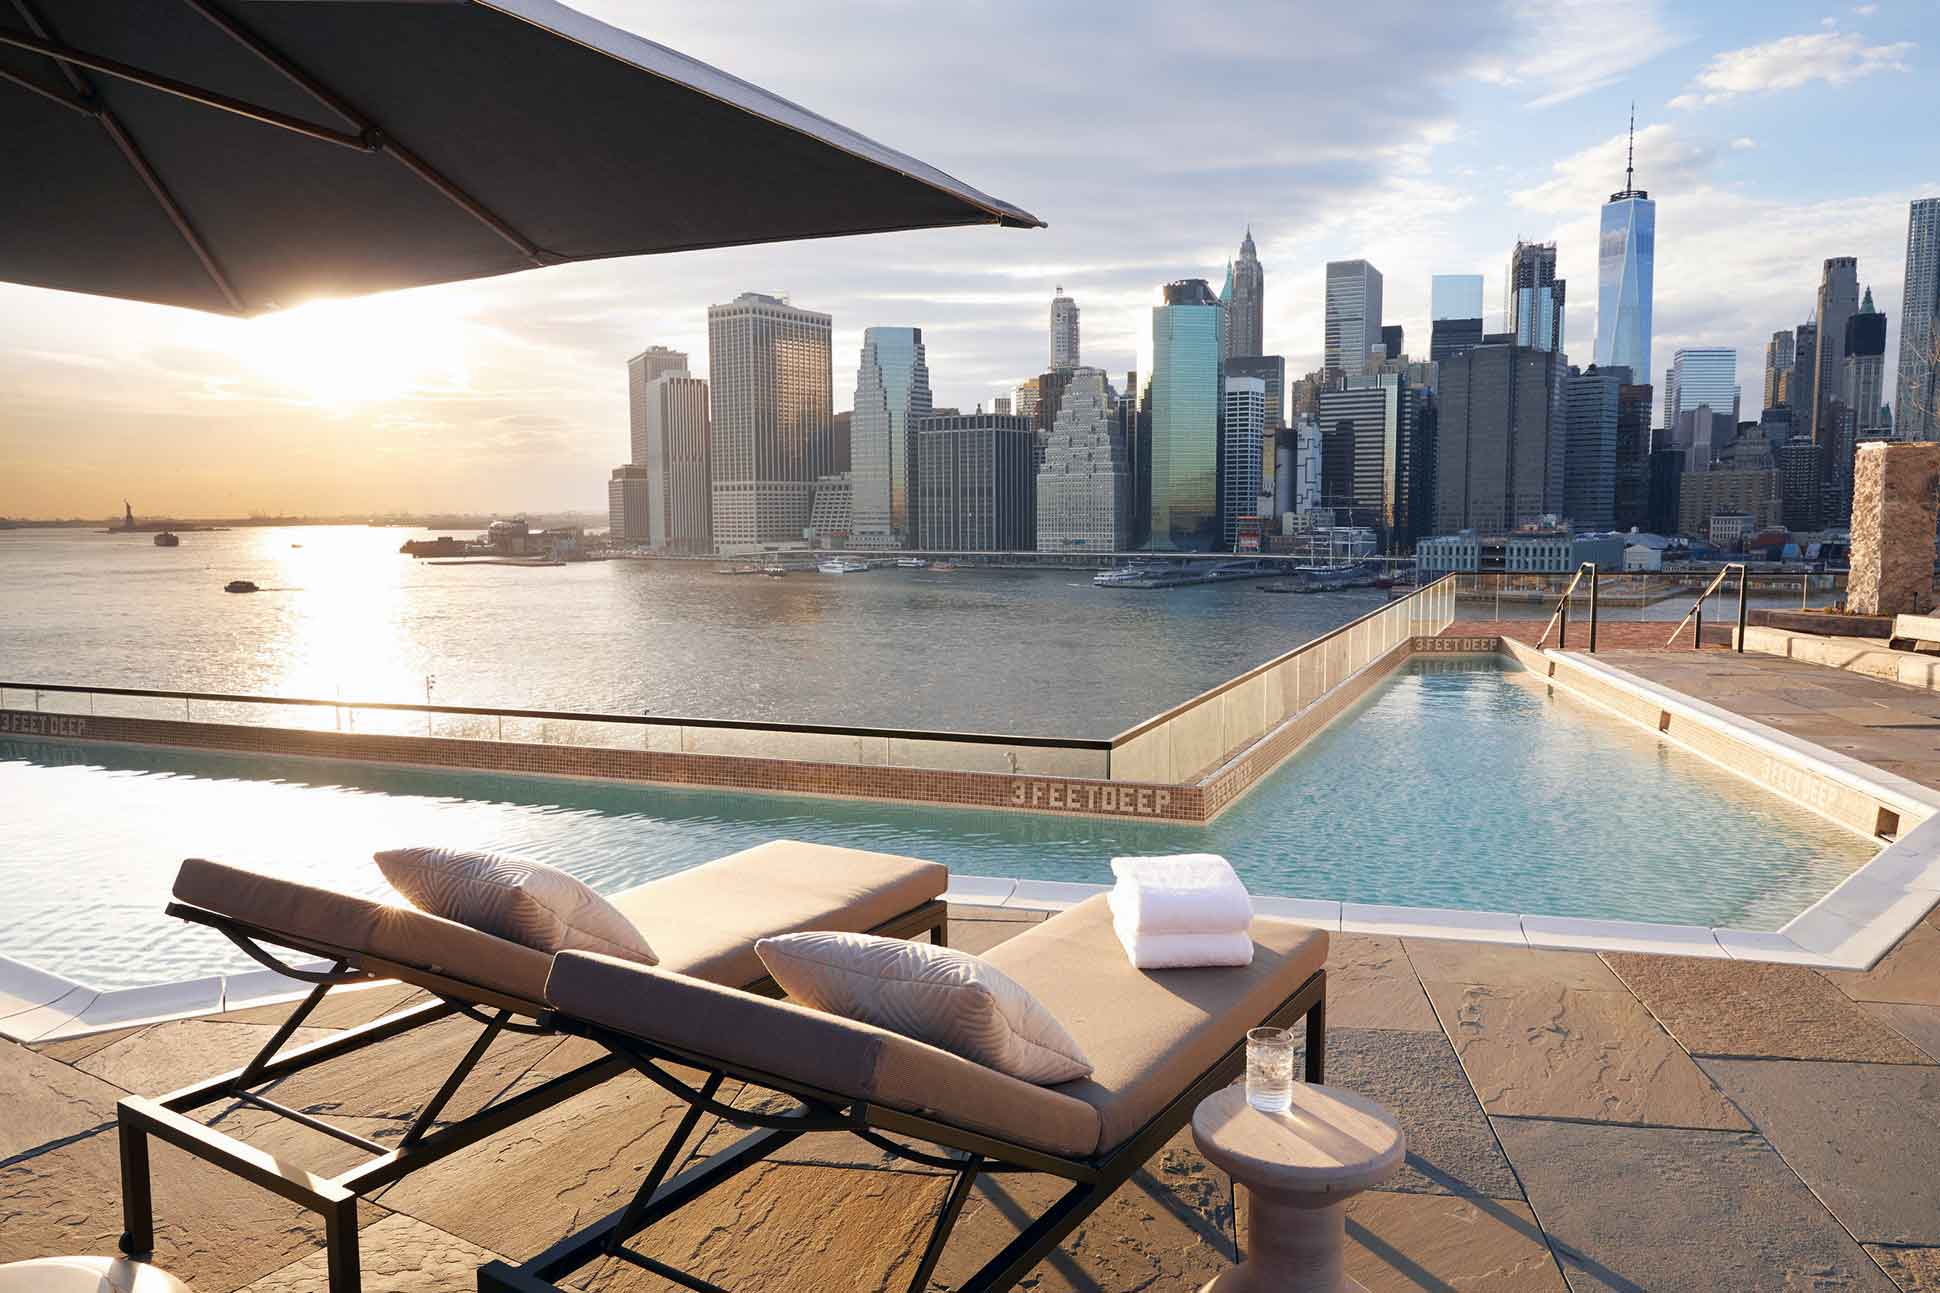 1 Hotel Brooklyn Bridge New York NYC pool deck and view